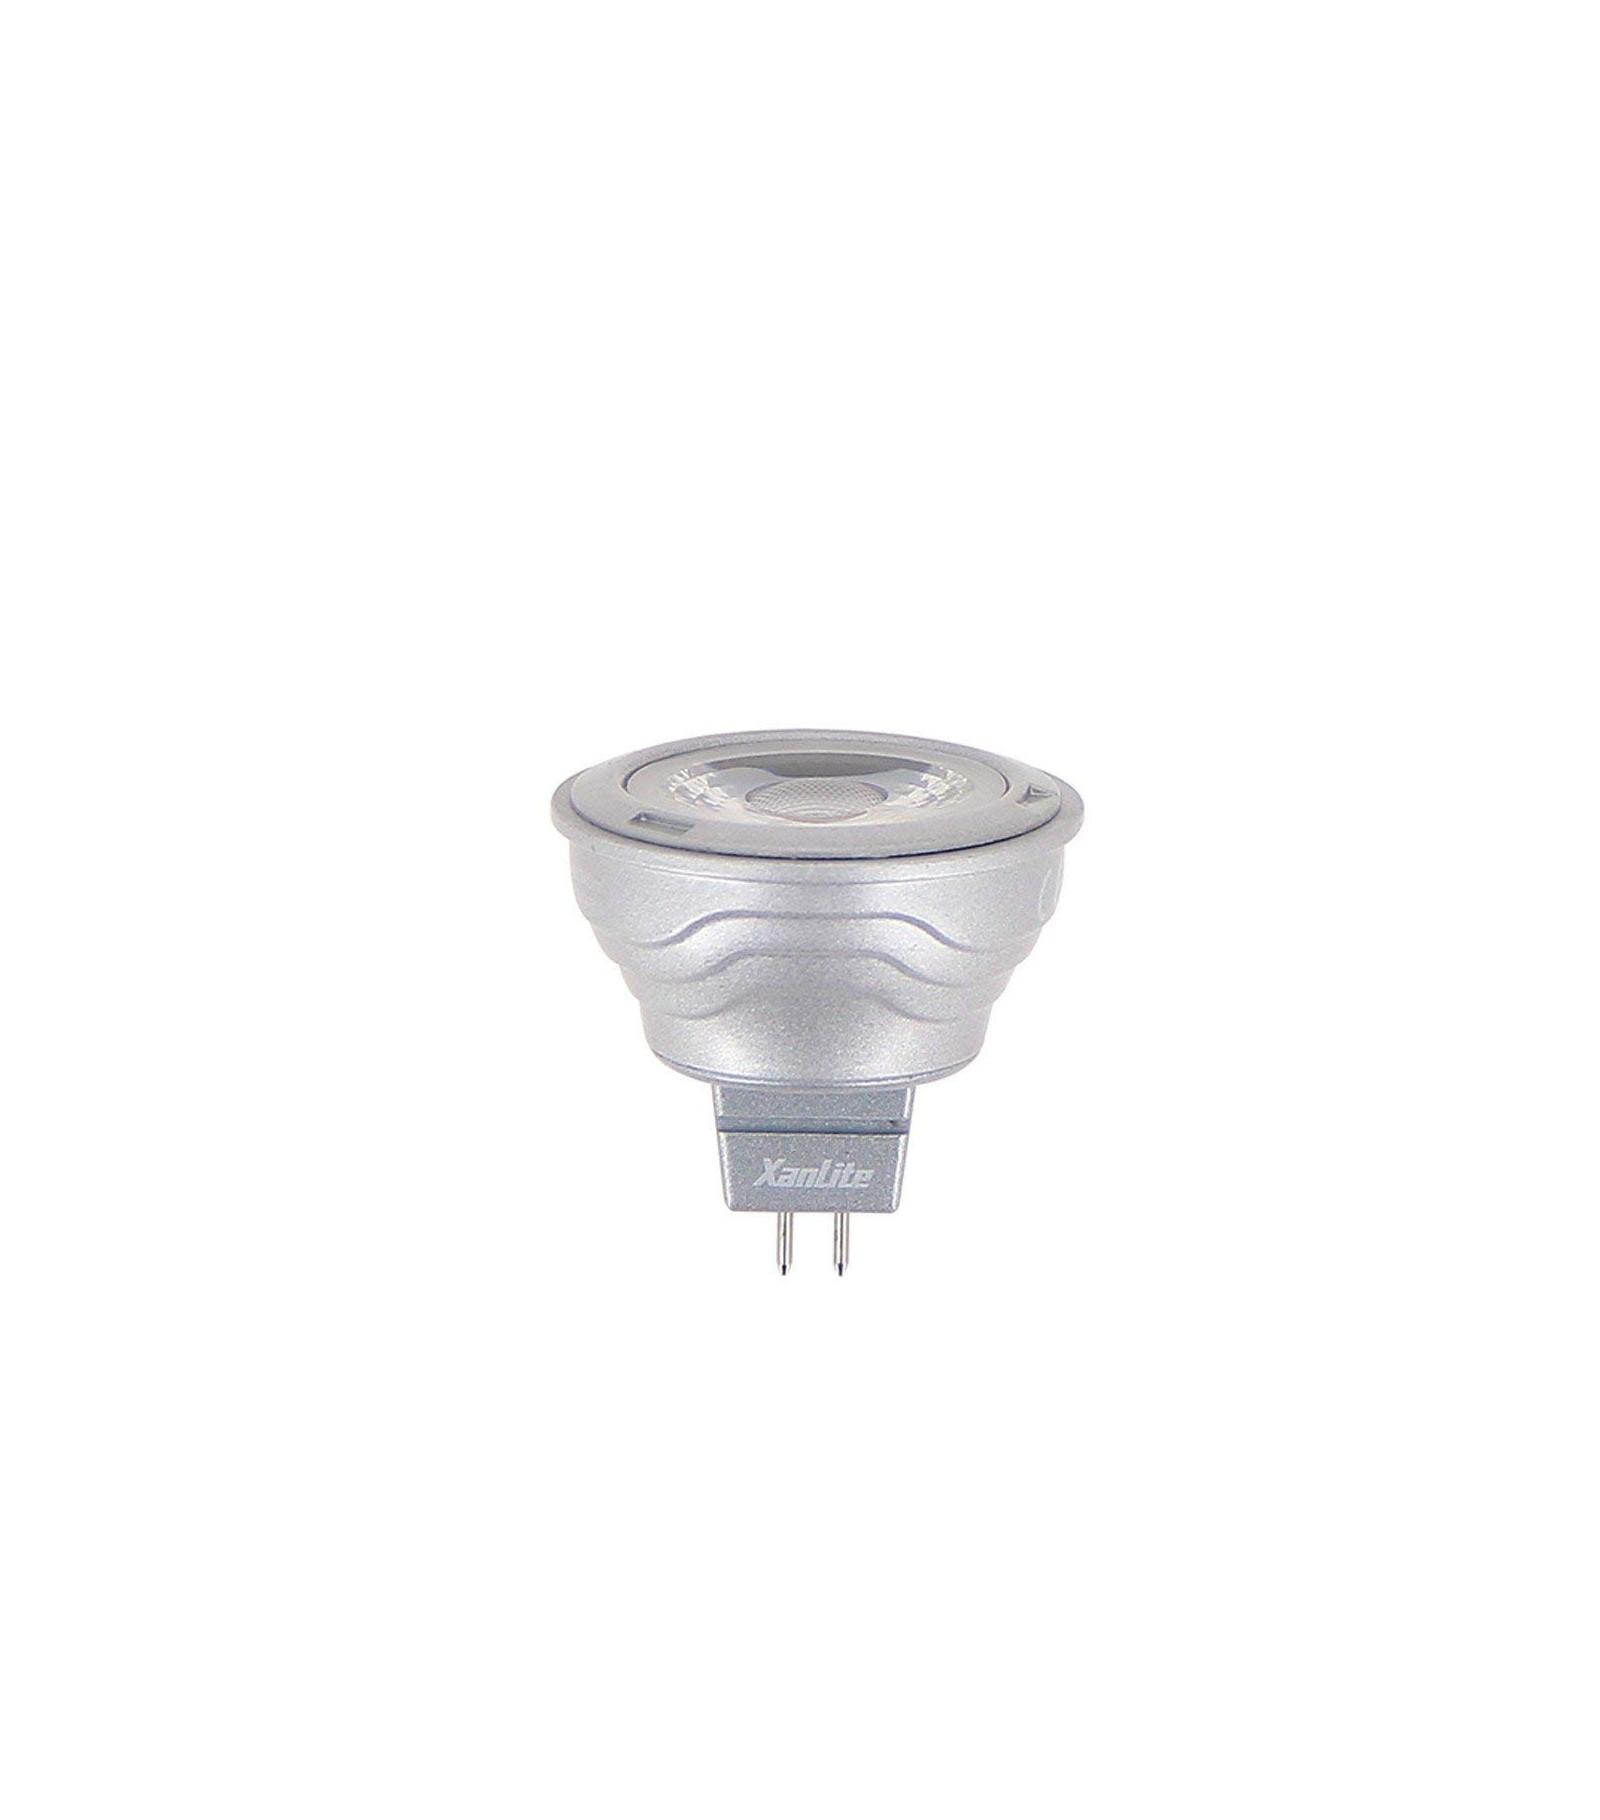 ampoule led gu5 3 mr11 5 5w 345lm quiv 35w blanc chaud 36 12v xanlite gu5 3 siageo. Black Bedroom Furniture Sets. Home Design Ideas